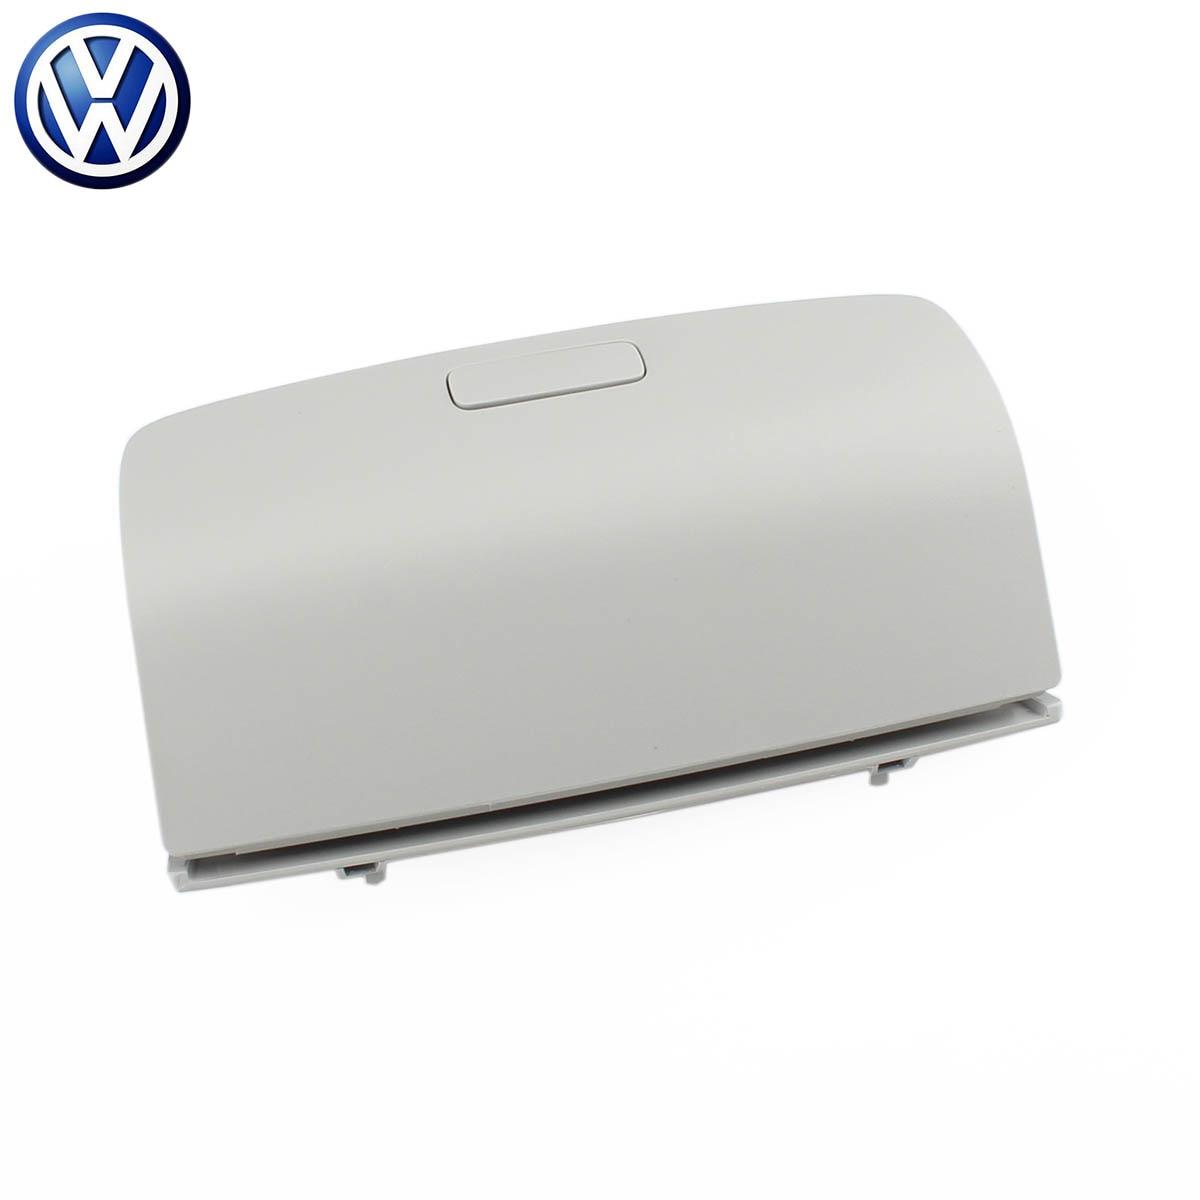 OEM 1K0 868 837 Grey Car Sun Glasses Case Storage Box fit for VW Golf MK6